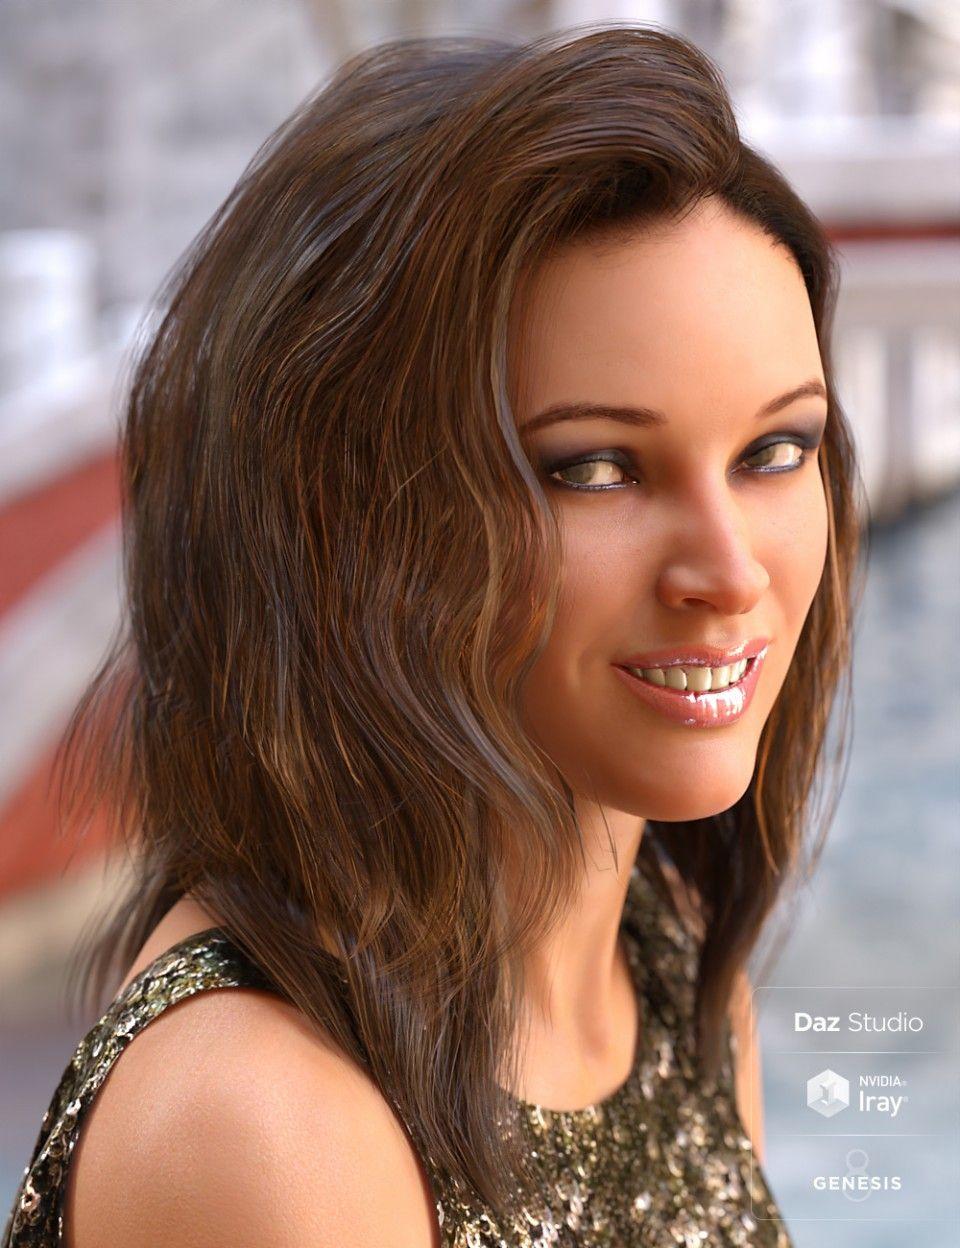 Apex Hair For Genesis 3 Genesis 8 Females Daz Poser Pinterest